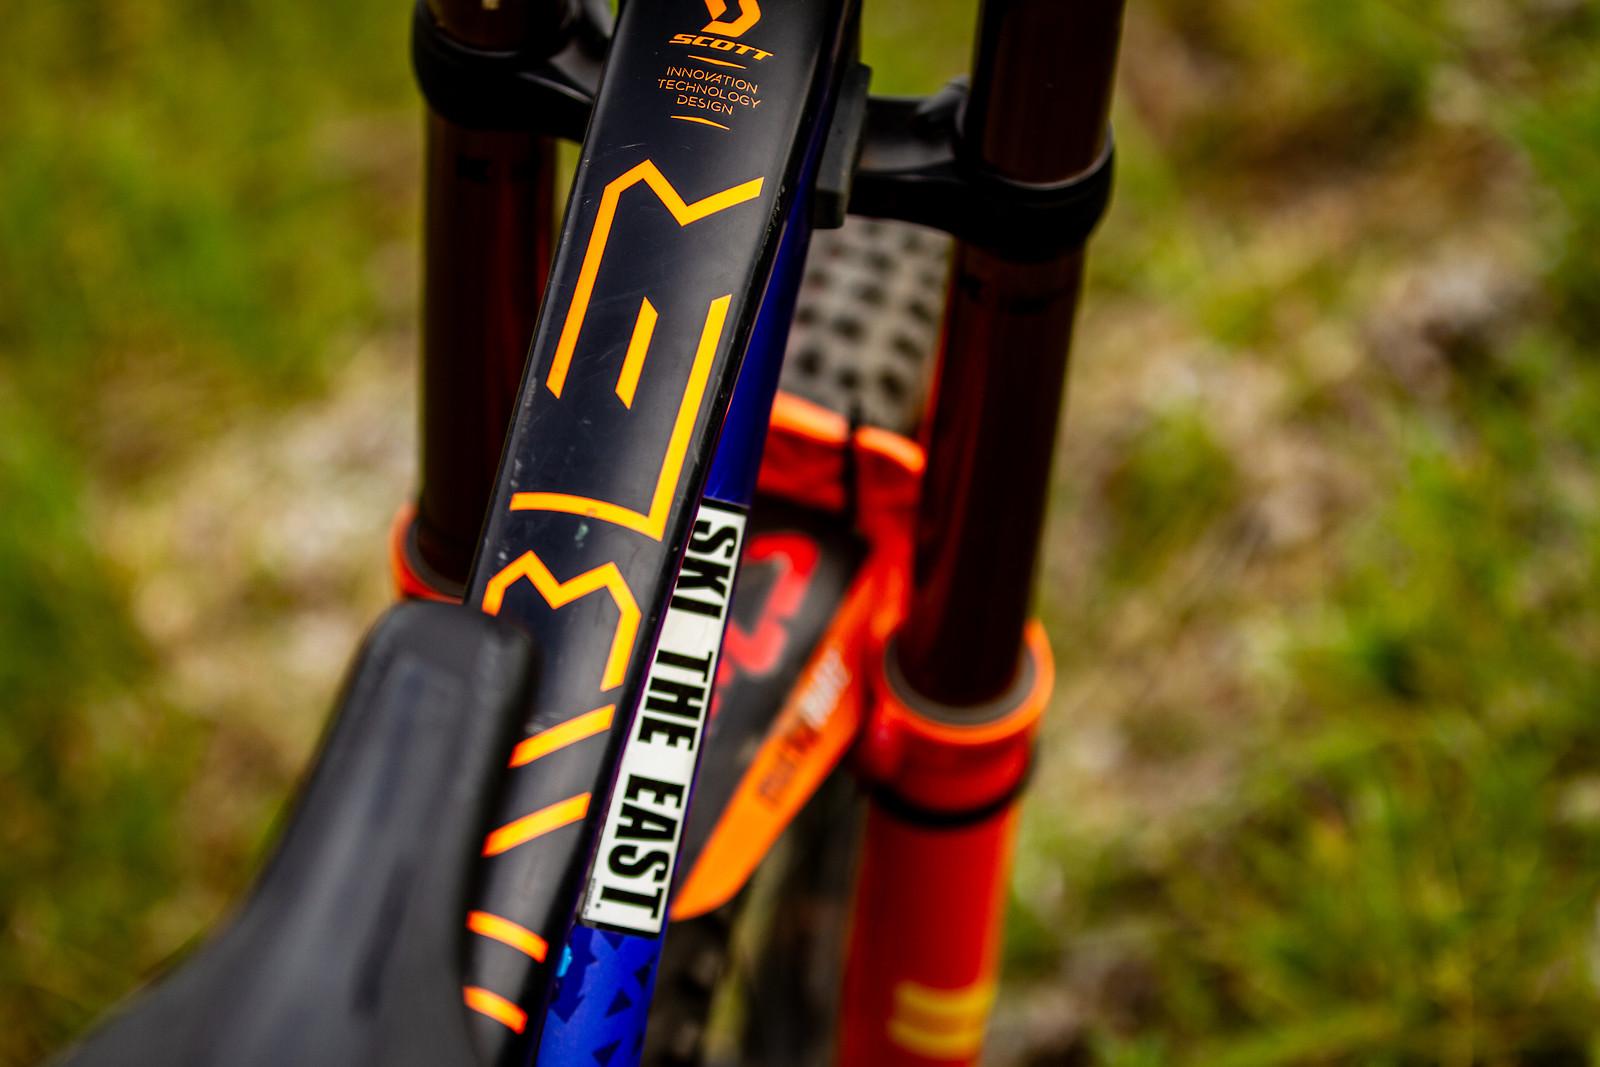 SKI THE EAST - JackRice - Mountain Biking Pictures - Vital MTB